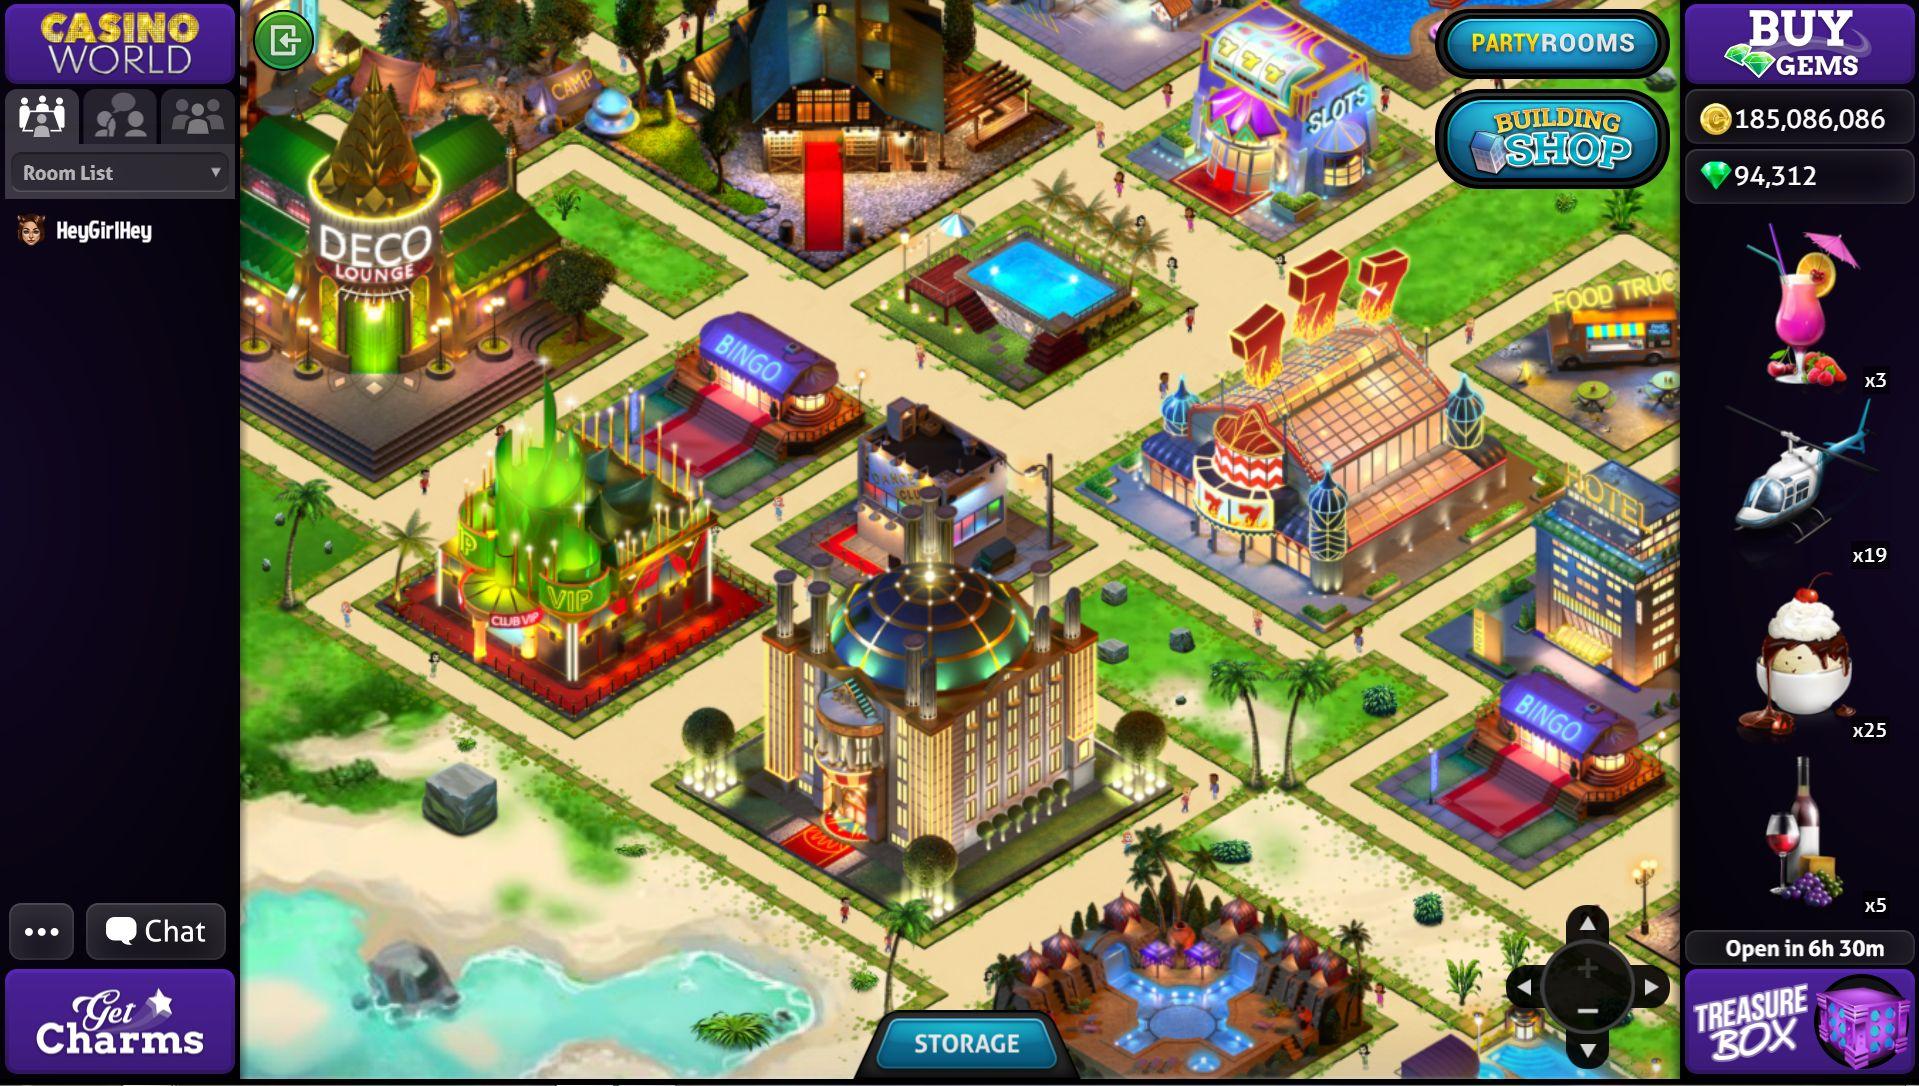 Casino World City